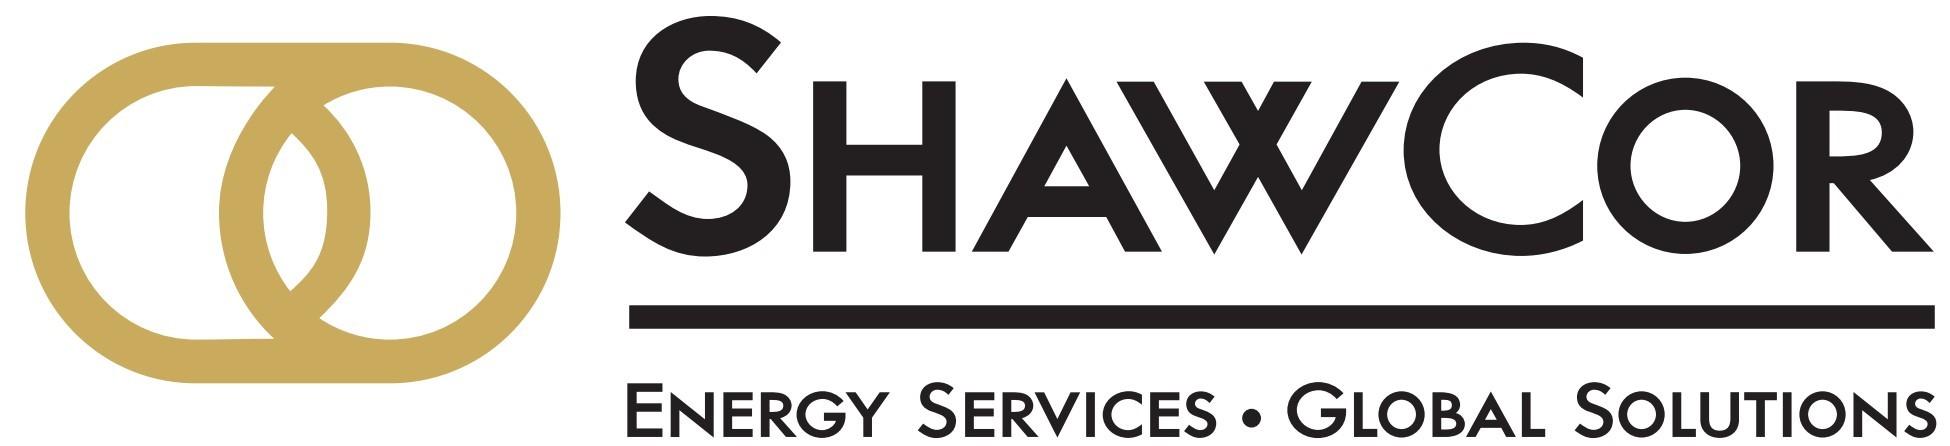 Shawcor Logo [PDF] png